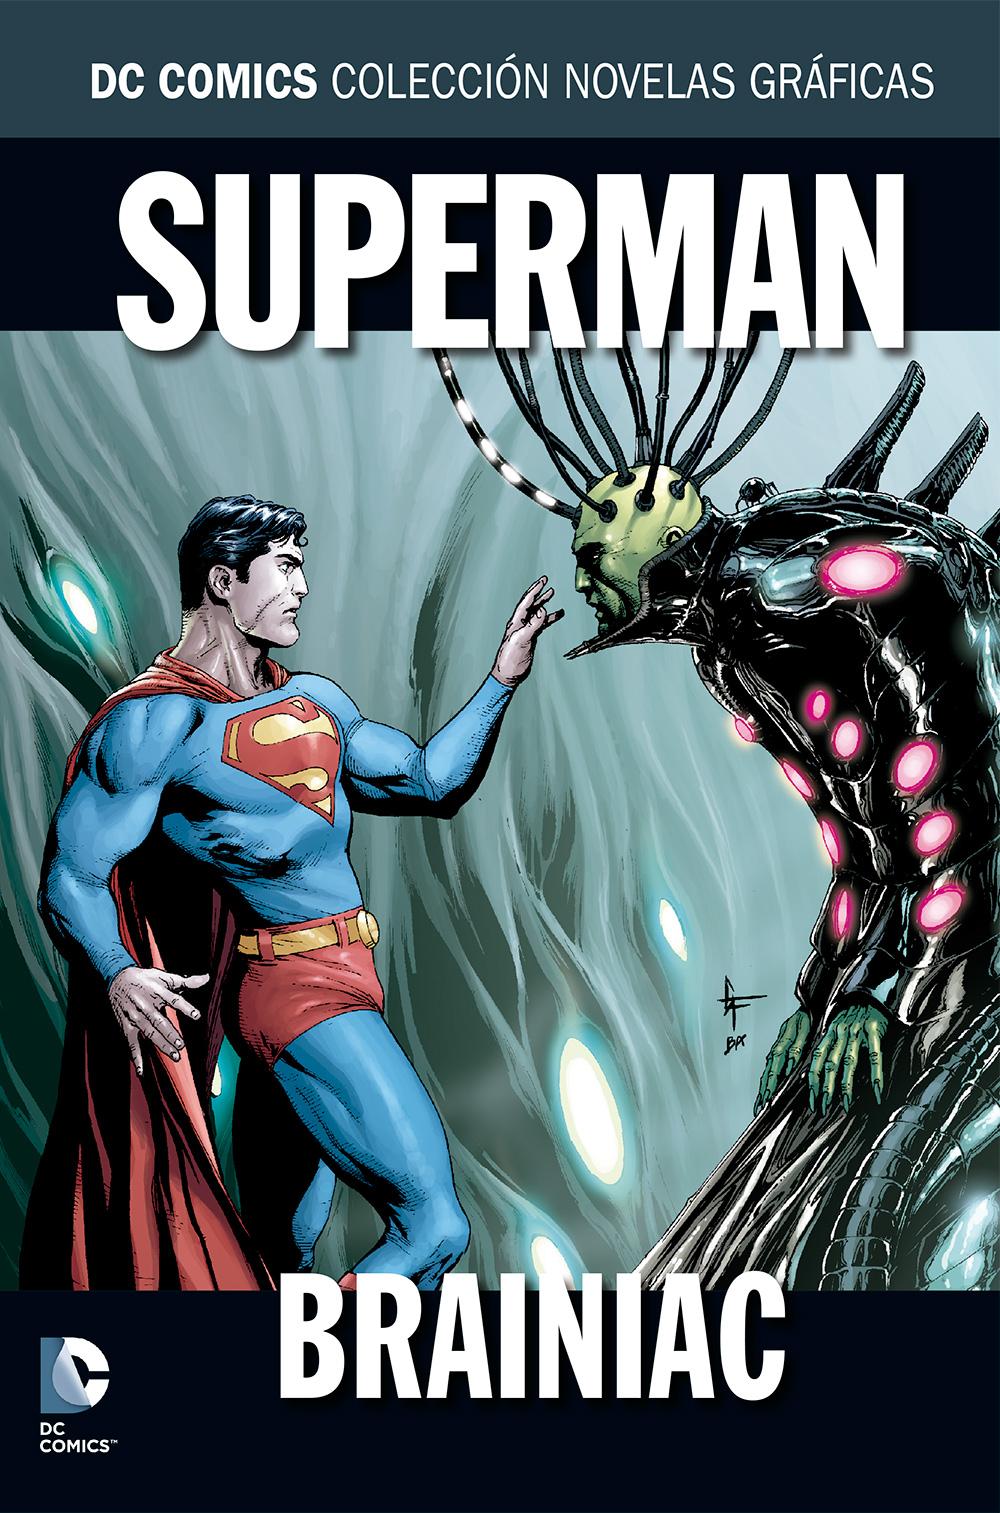 836 - [DC - Salvat] La Colección de Novelas Gráficas de DC Comics  SF118_031_01_001